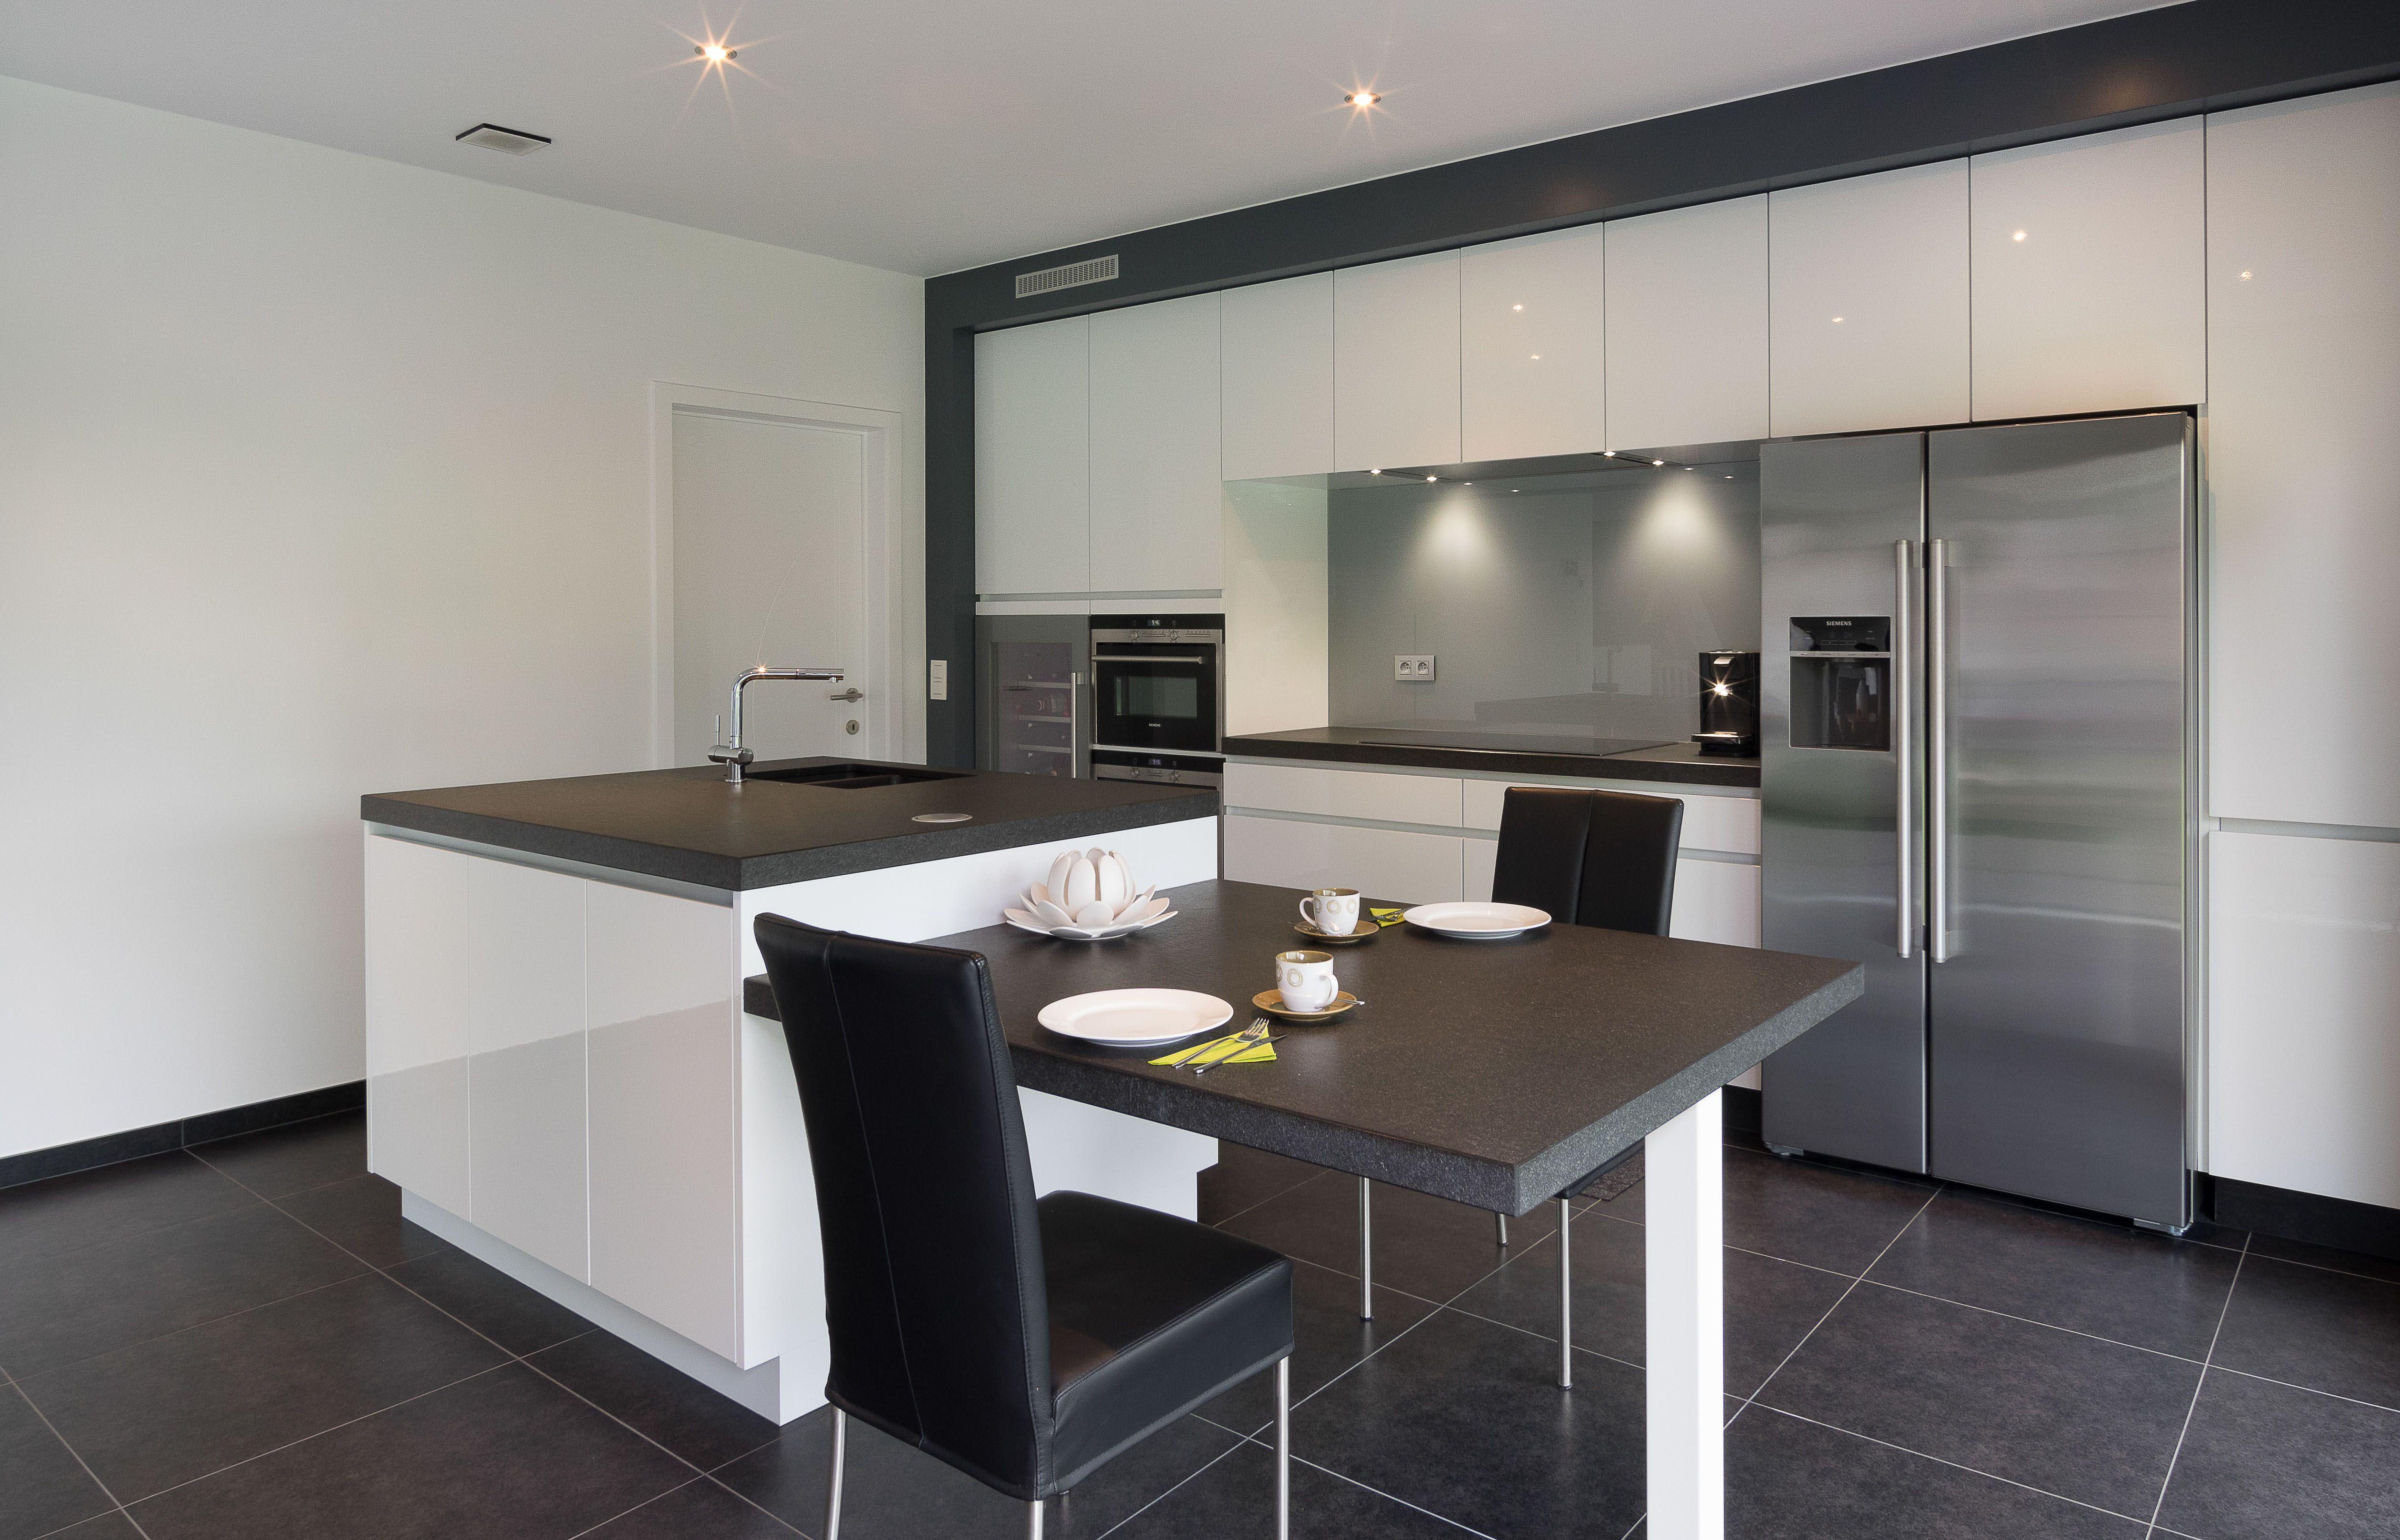 Bouwonderneming ooms moderne keuken in folie met granieten